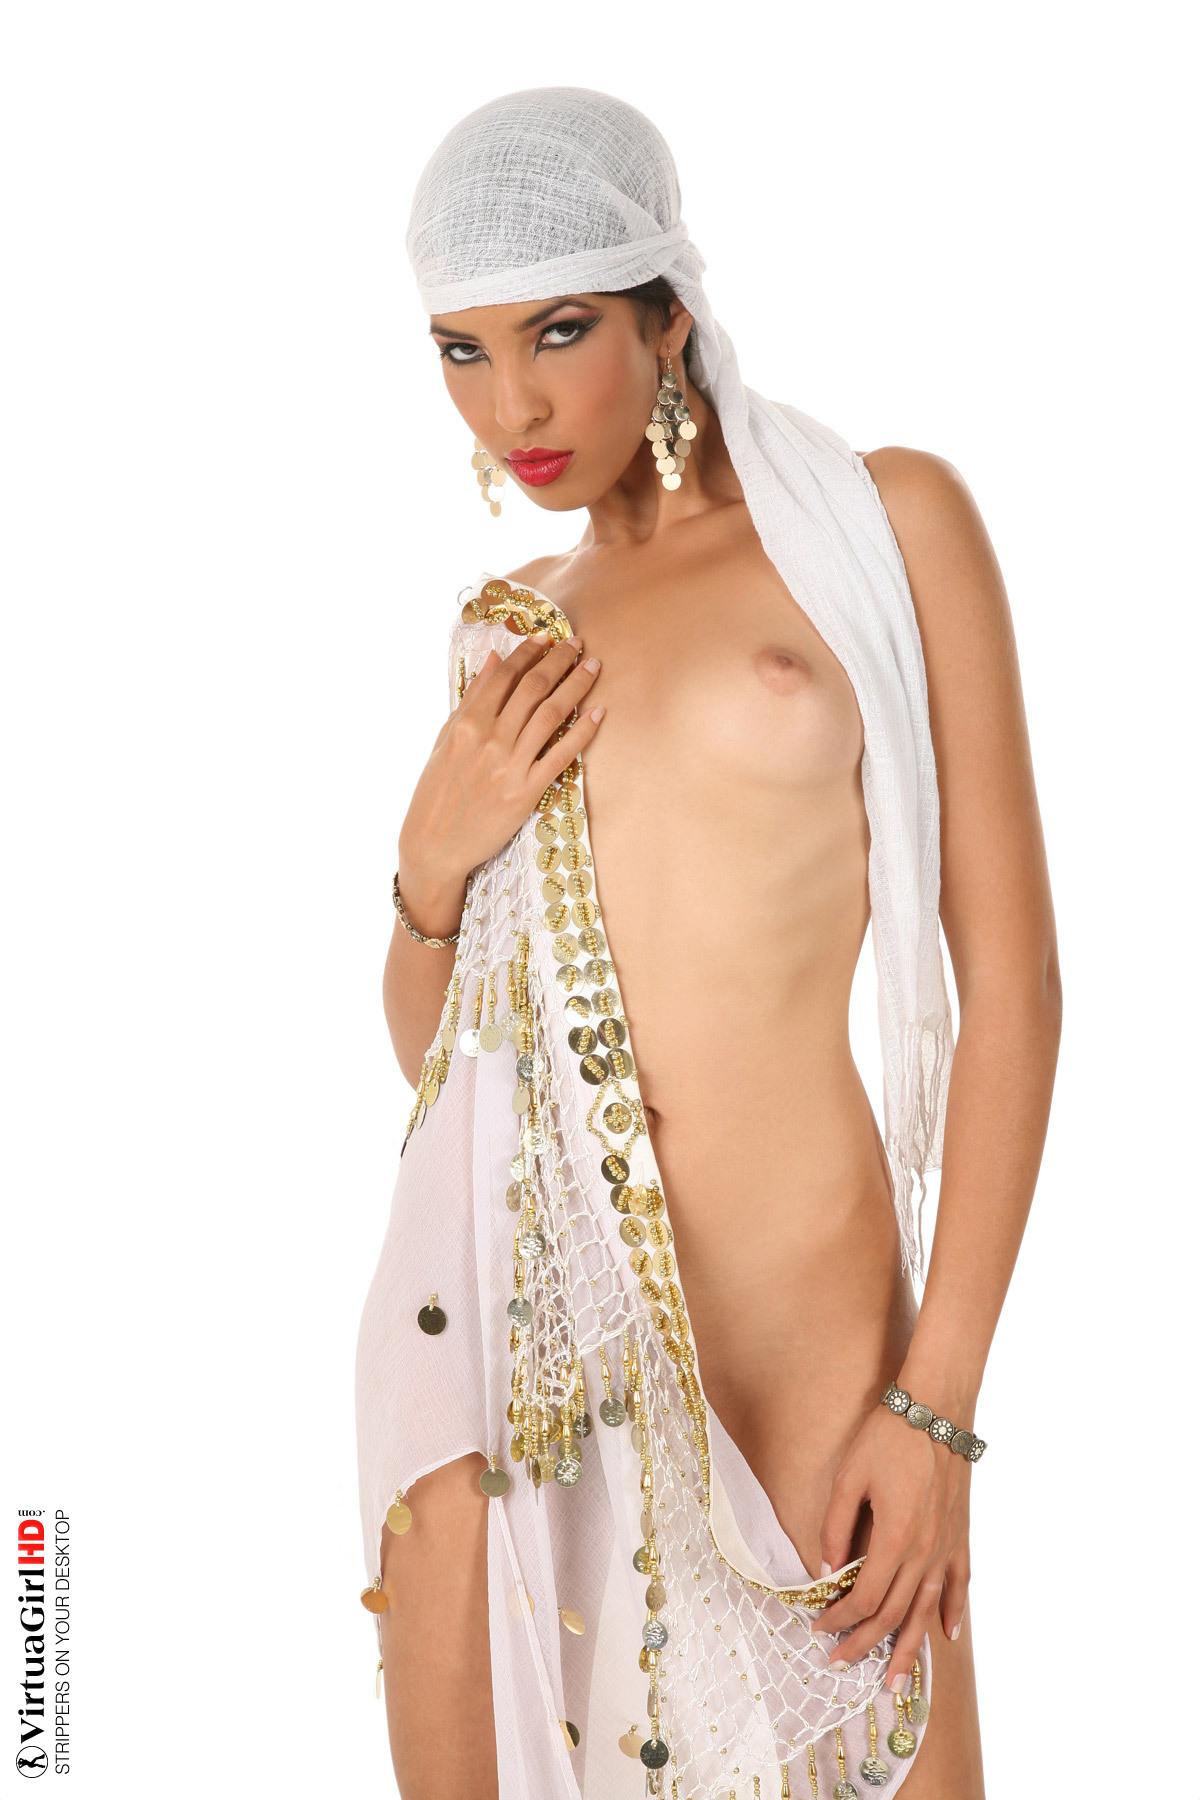 girls stripping showing nude ass